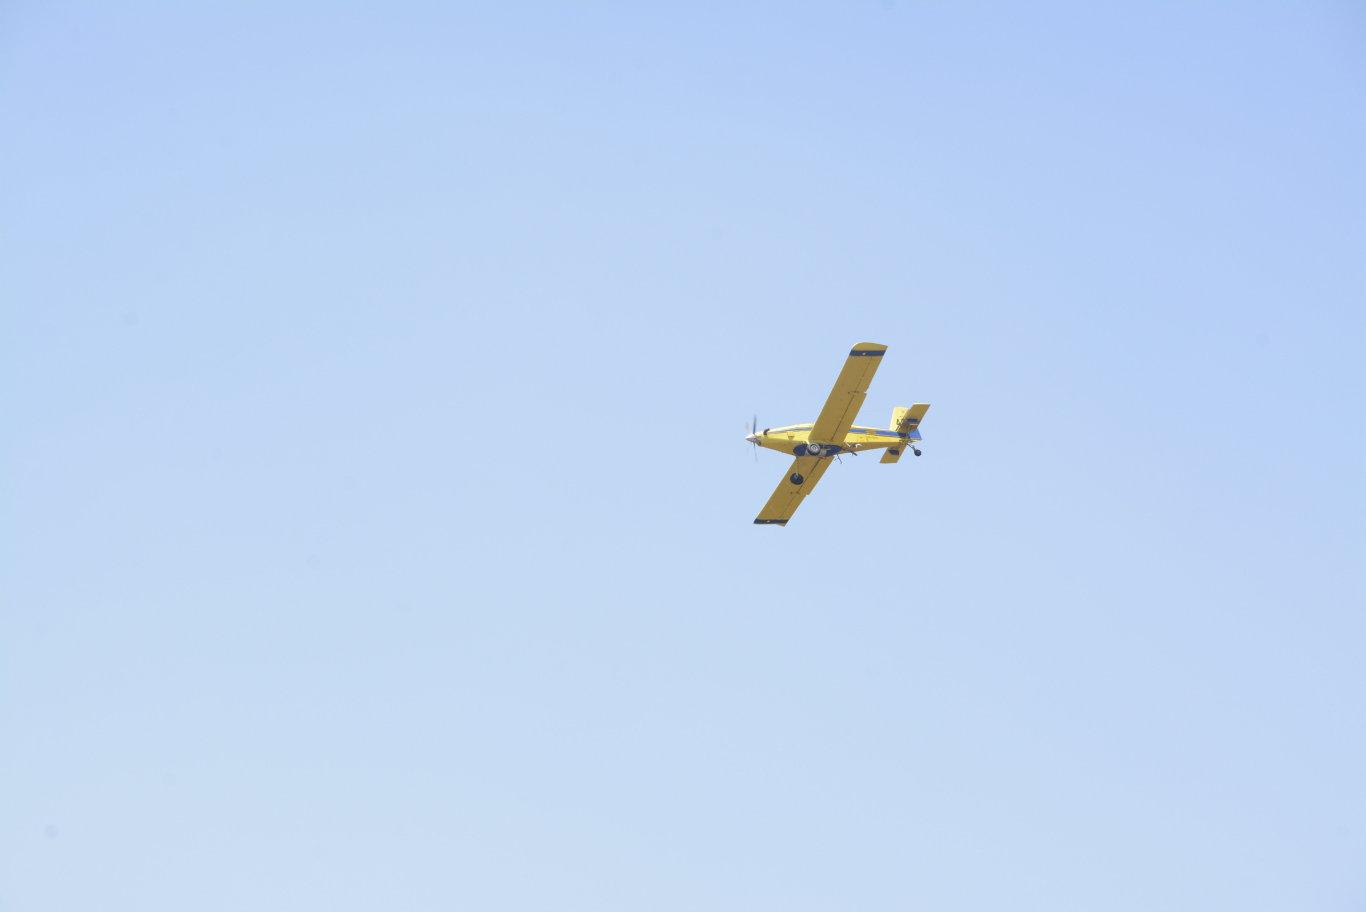 Waterbombers were called to douse the Pechey bushfire, north of Toowoomba, November 14.